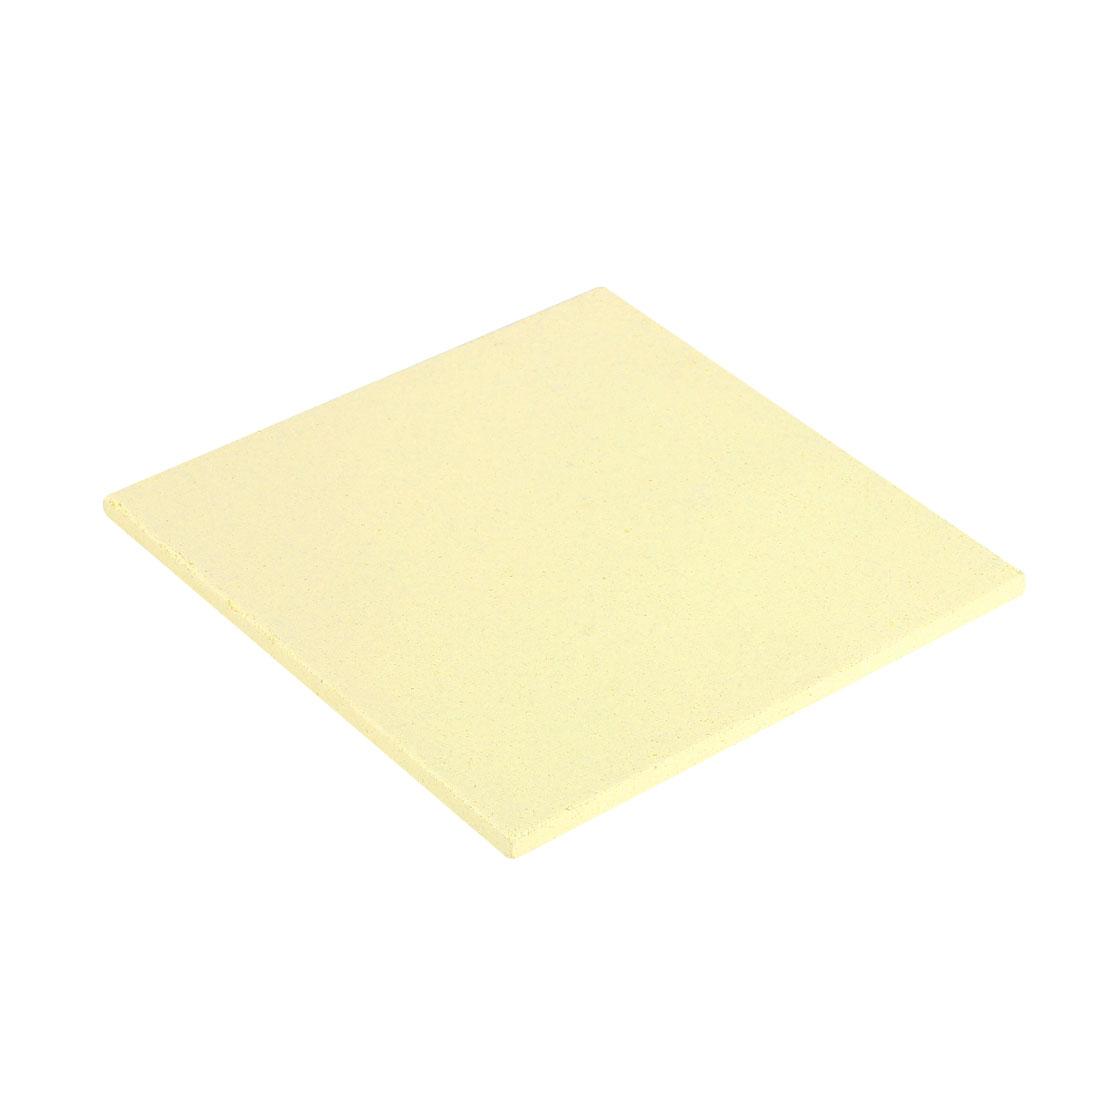 Soldering Board Ceramic Hard Insulation Board 2.8 x 2.8 x 0.1inch/70 x 70 x 3mm